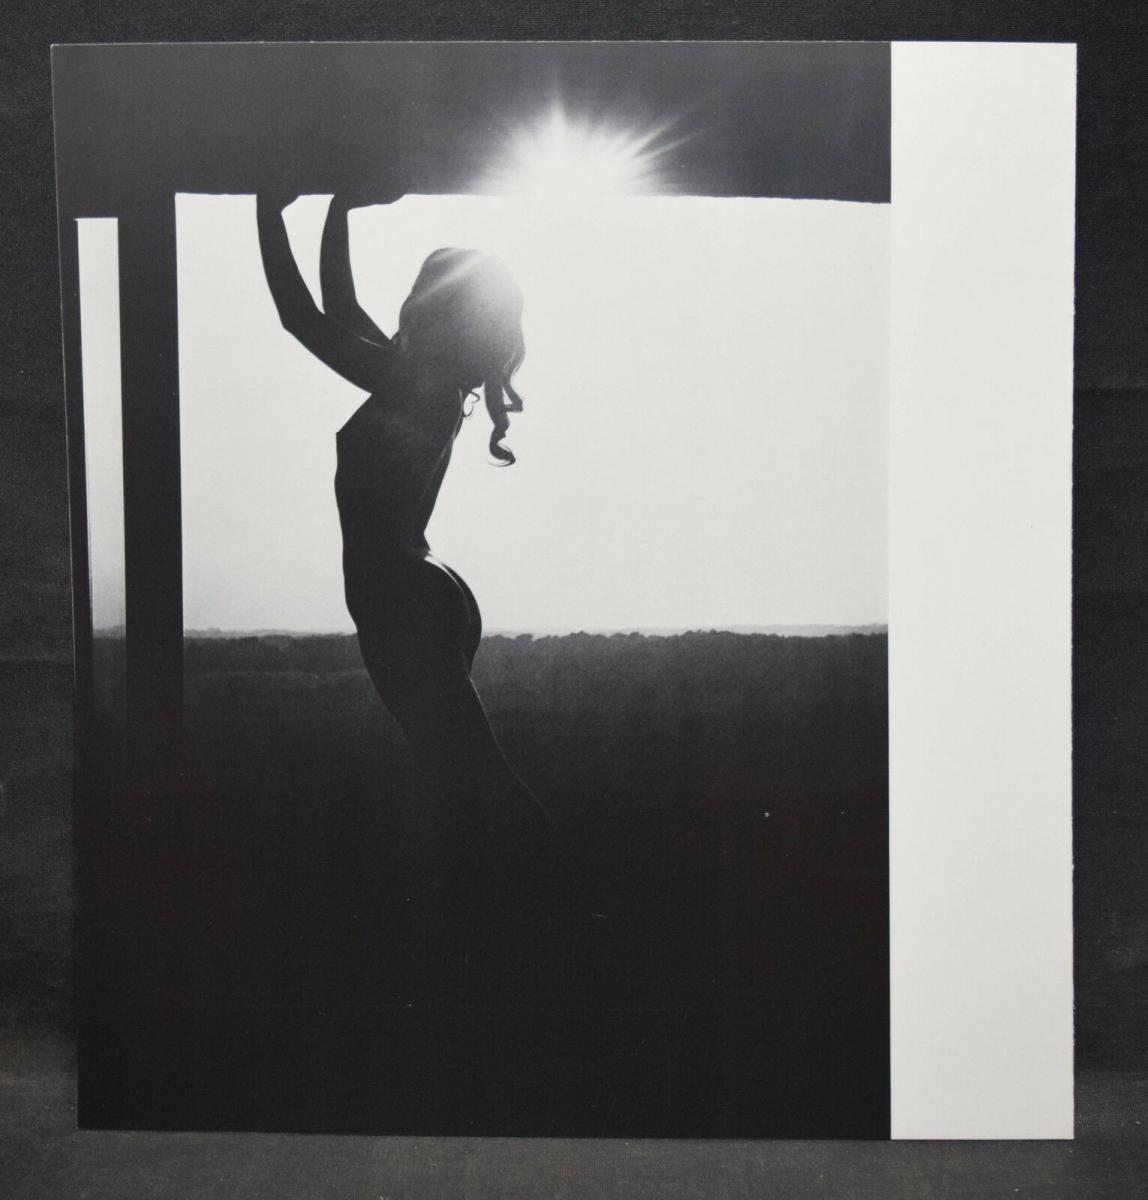 ANDRÉ KRETZ - CANTATE A NAUSICAA - WIDMUNG - ORIGINALZEICHNUNG - 1980 - FOTOS 0